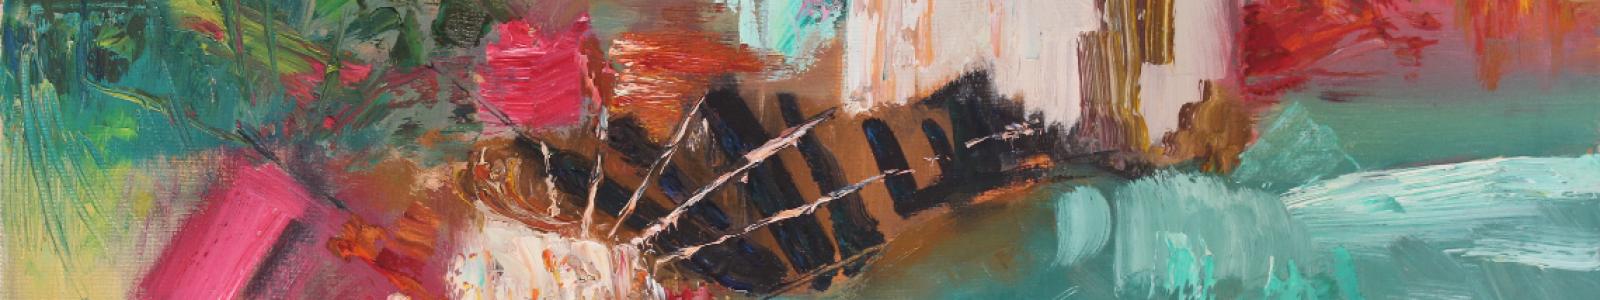 Gallery Painter Farida Yeskazy